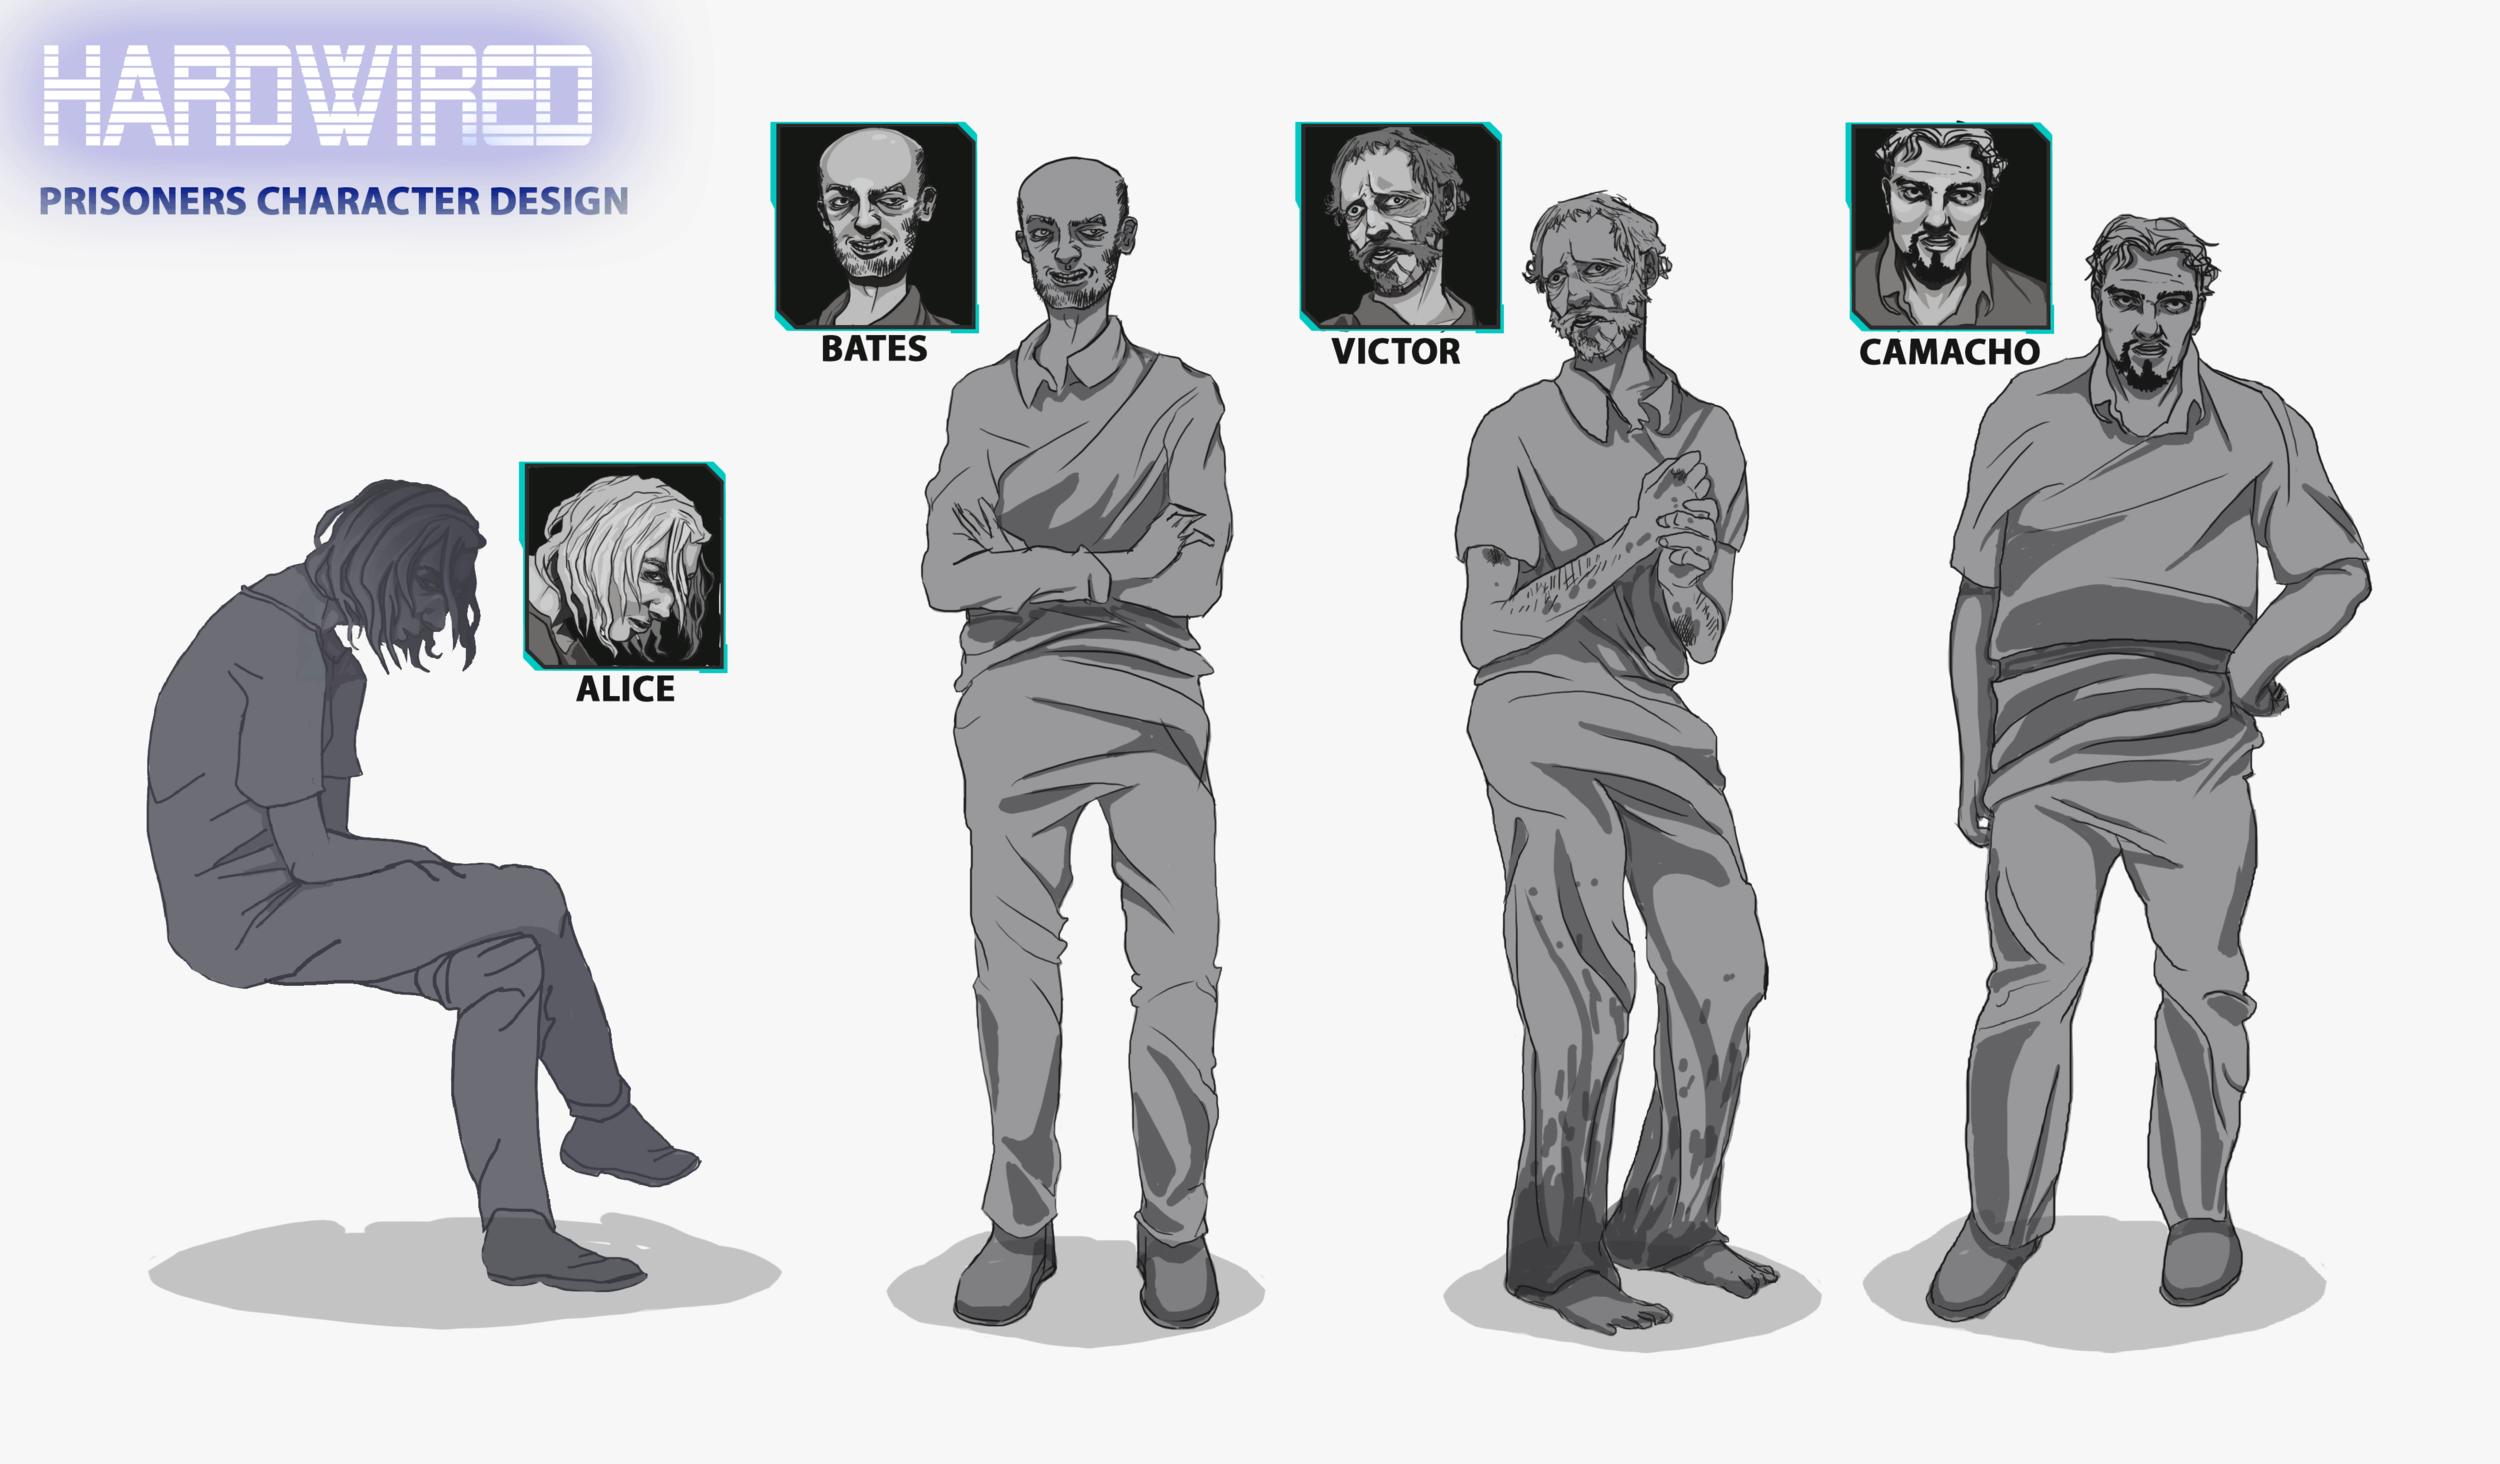 Character Design Sheet - Prisoners by Adela Kapuścińska. 2017.